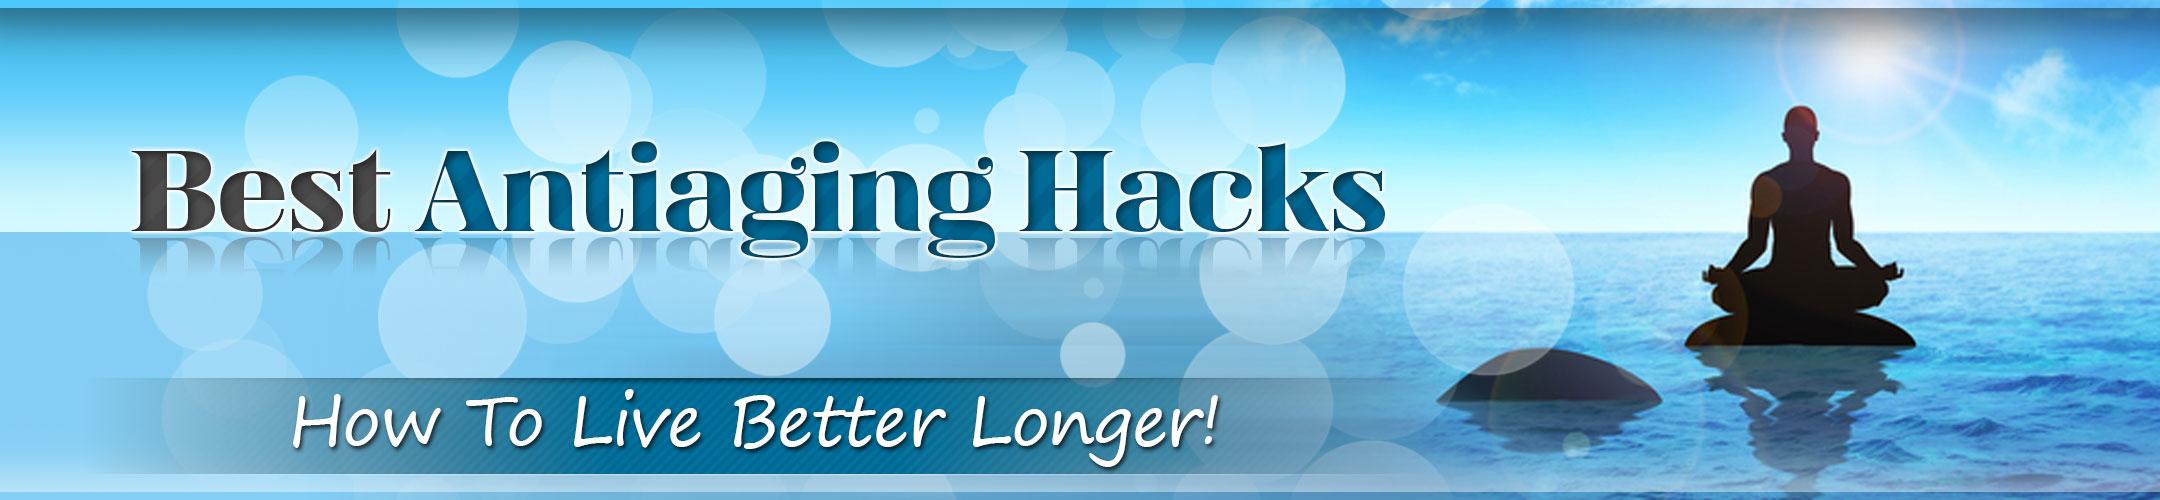 Best Anti-Aging Hacks